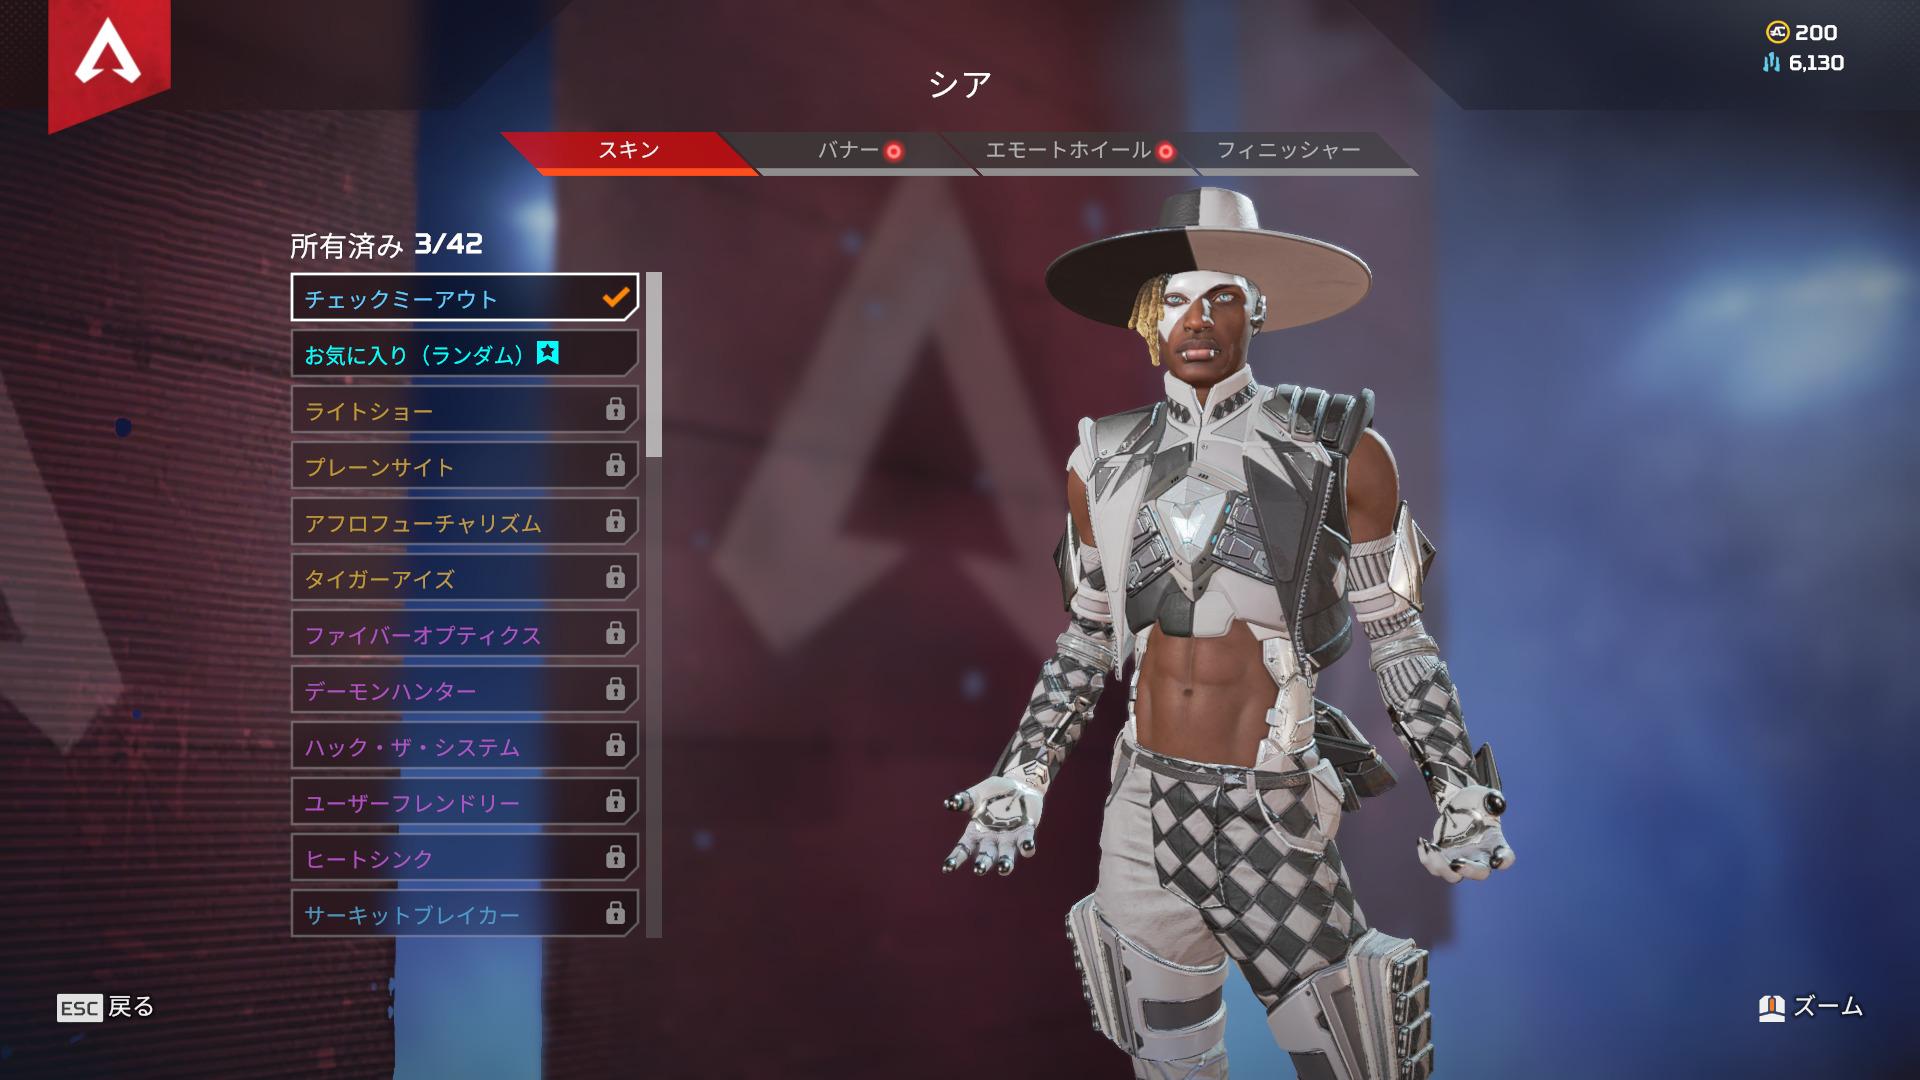 【APEX】『シア』のTwitch Prime限定スキンが登場!!「ゲーム内の見た目」や「入手方法」など